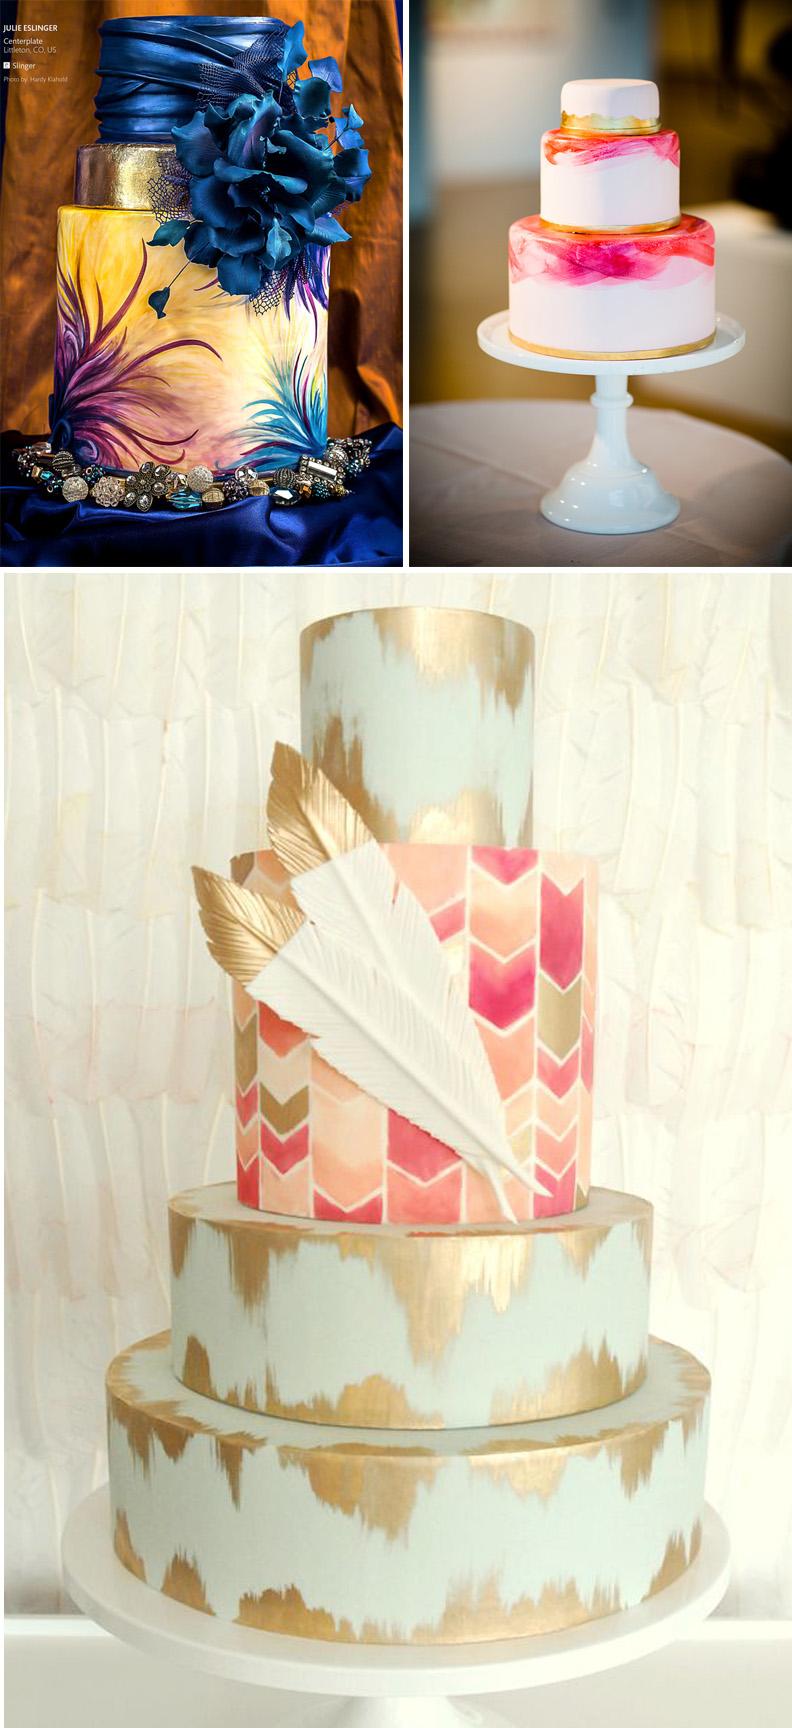 Image Credits: Jullie Eslinger, Whipped Bake Shop, The Cake Blog